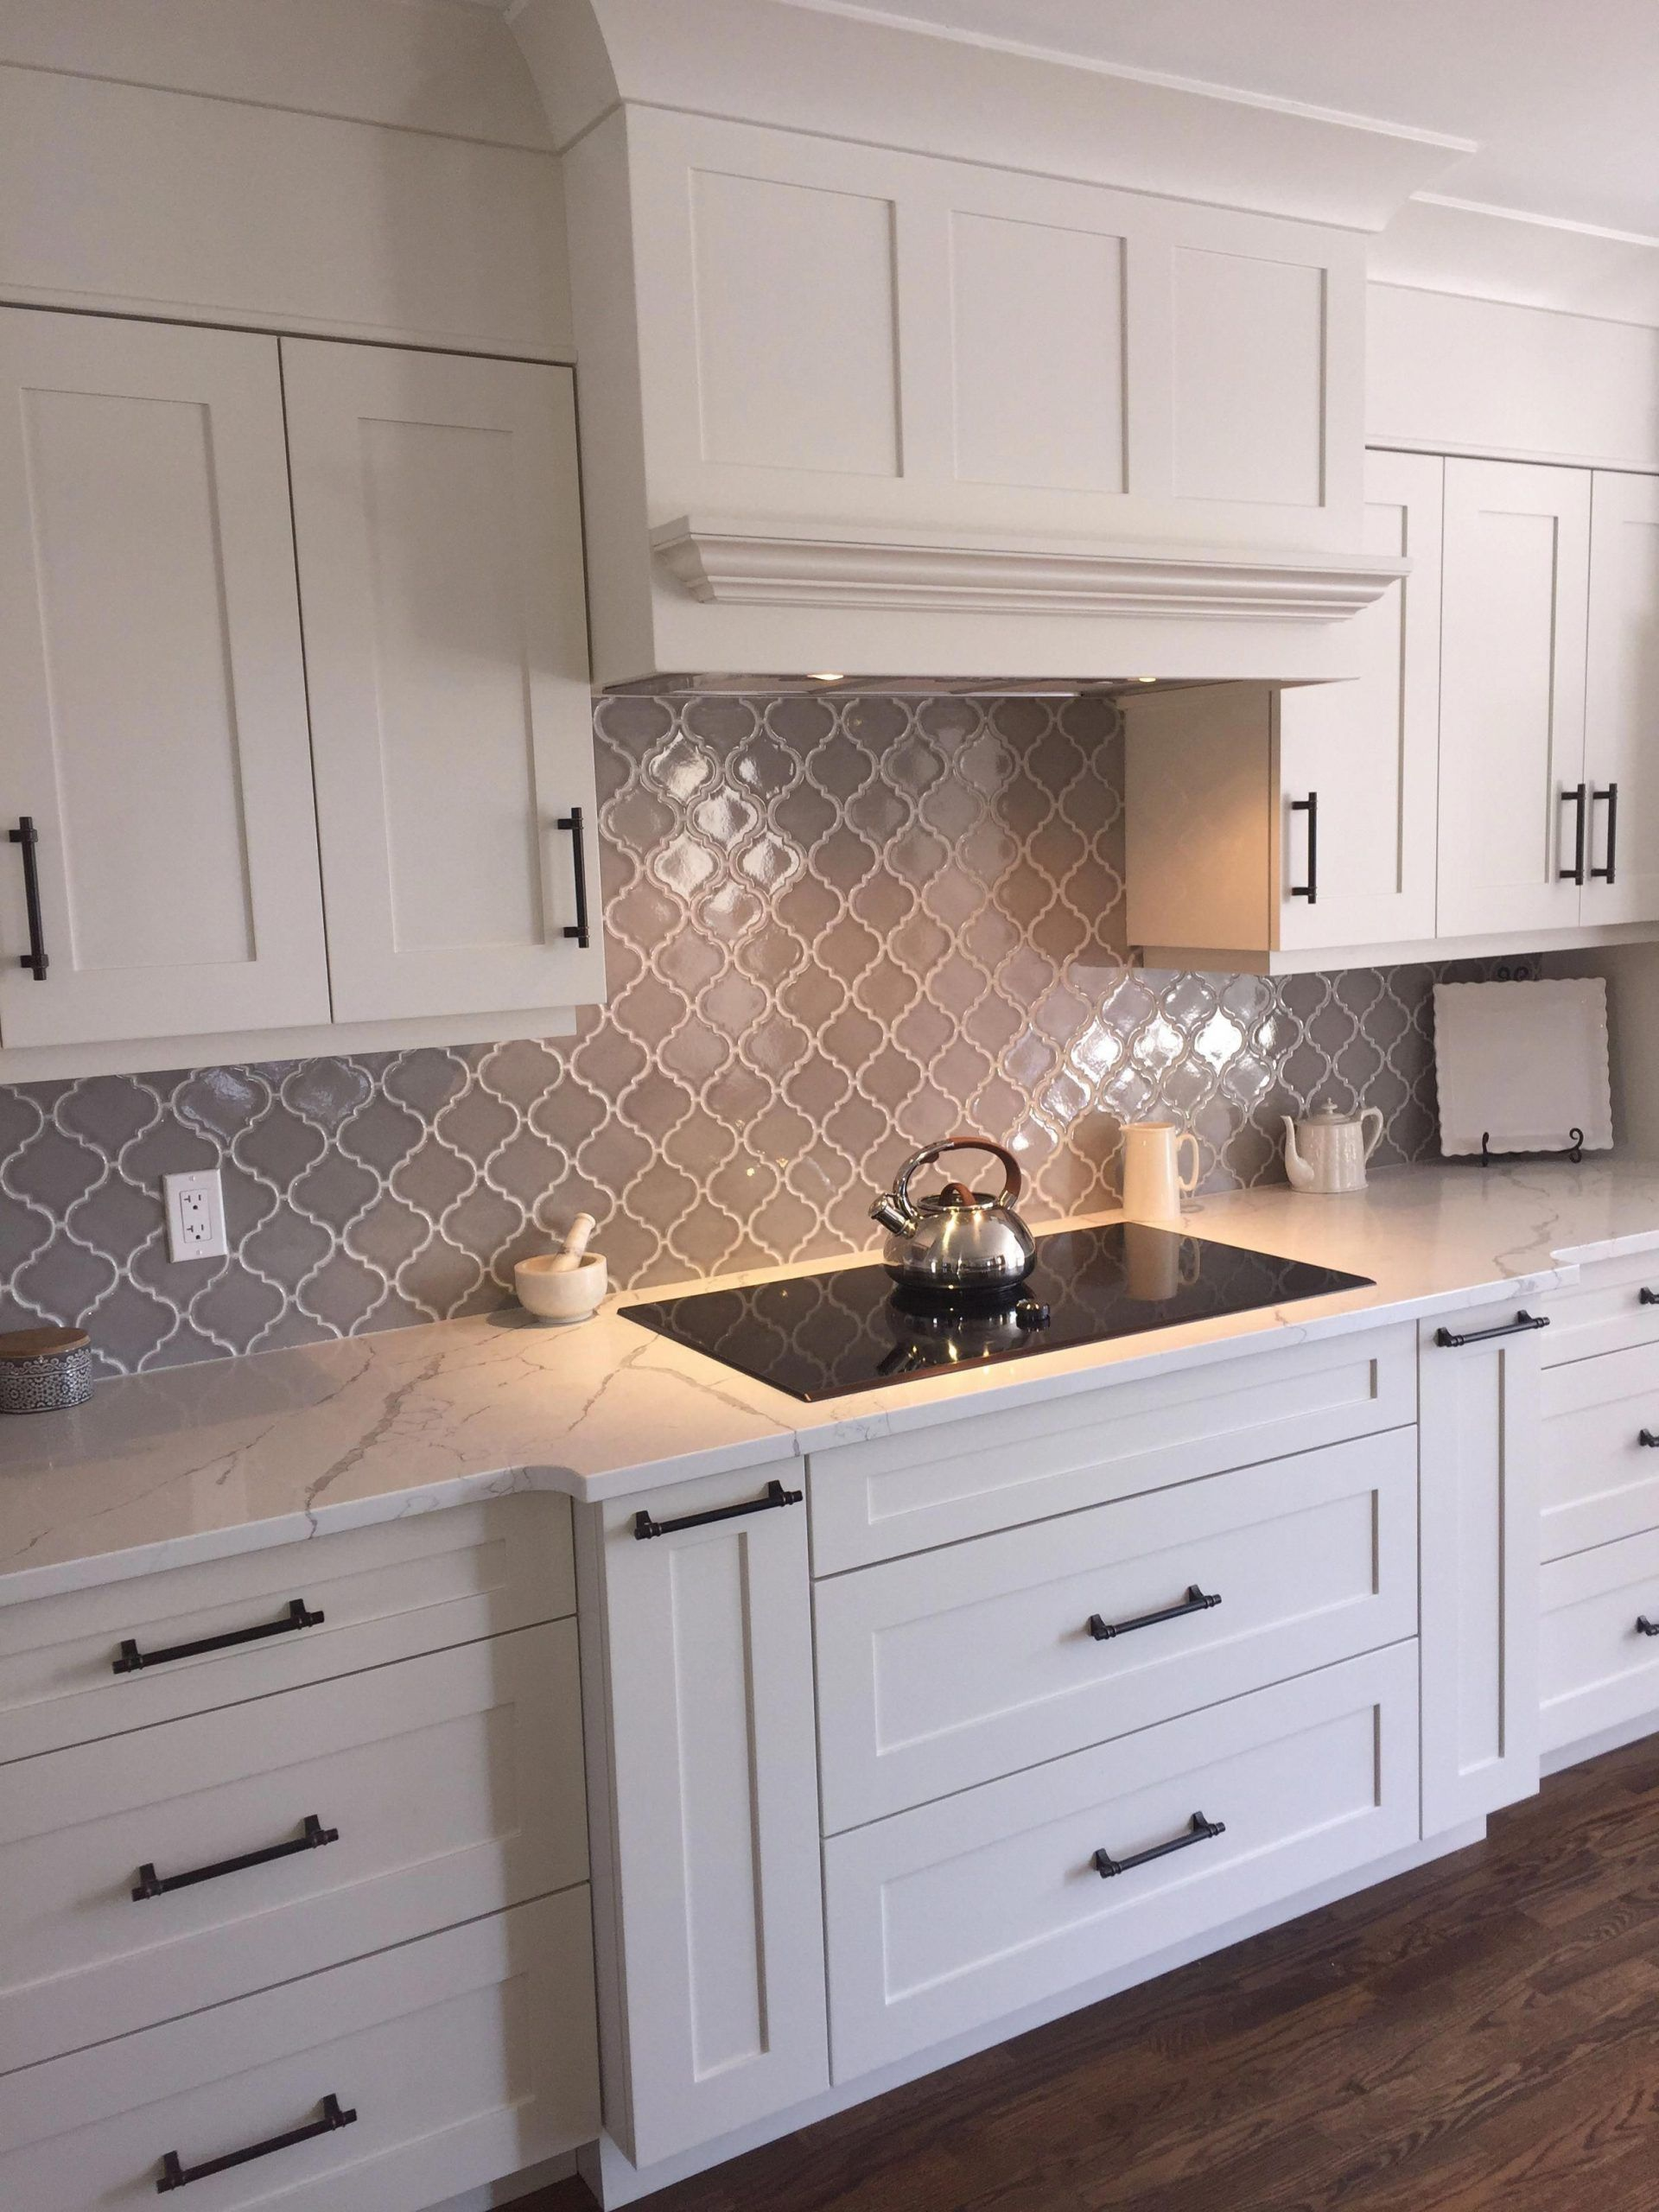 10 Inspiration Kitchen Backsplash Tile Kitchenbacksplashtile Kitchen Tiles Back Backspla In 2020 Kitchen Cabinet Design White Kitchen Design Kitchen Cabinets Decor